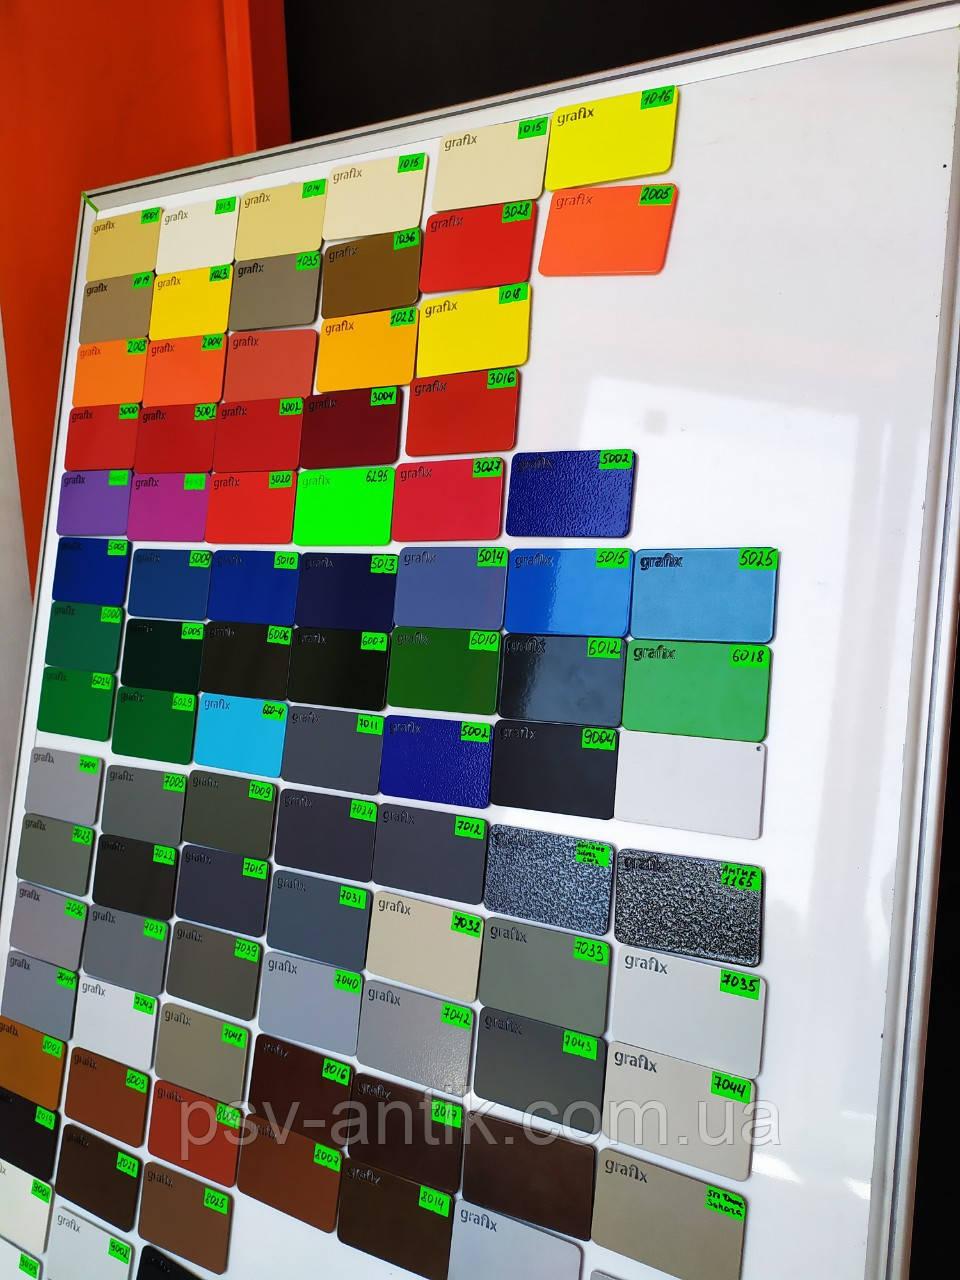 Порошковая краска глянцевая, полиэфирная, архитектурная, 5005